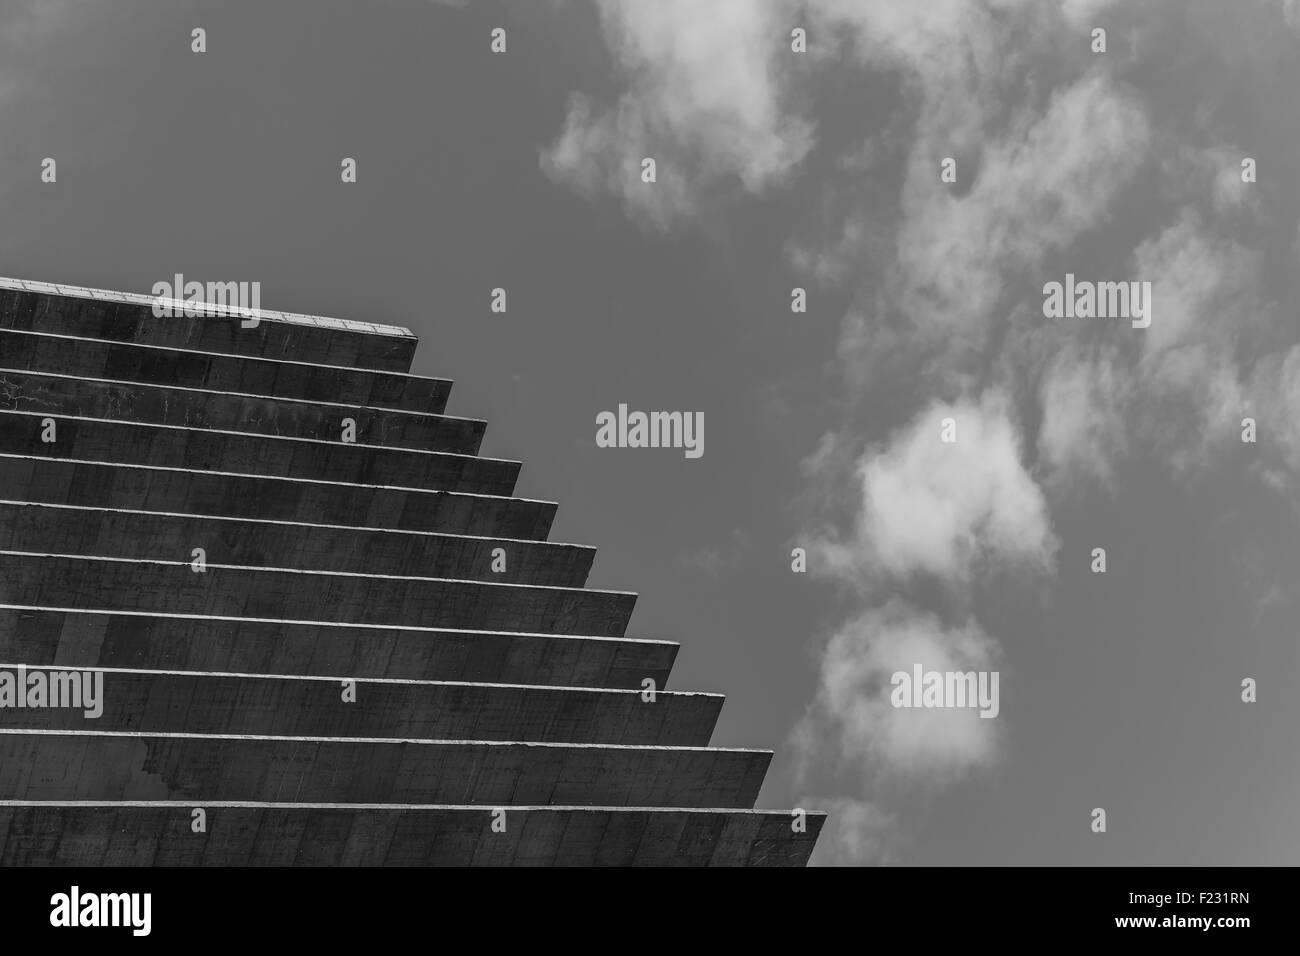 Beton und Sky Perspektive Stockbild